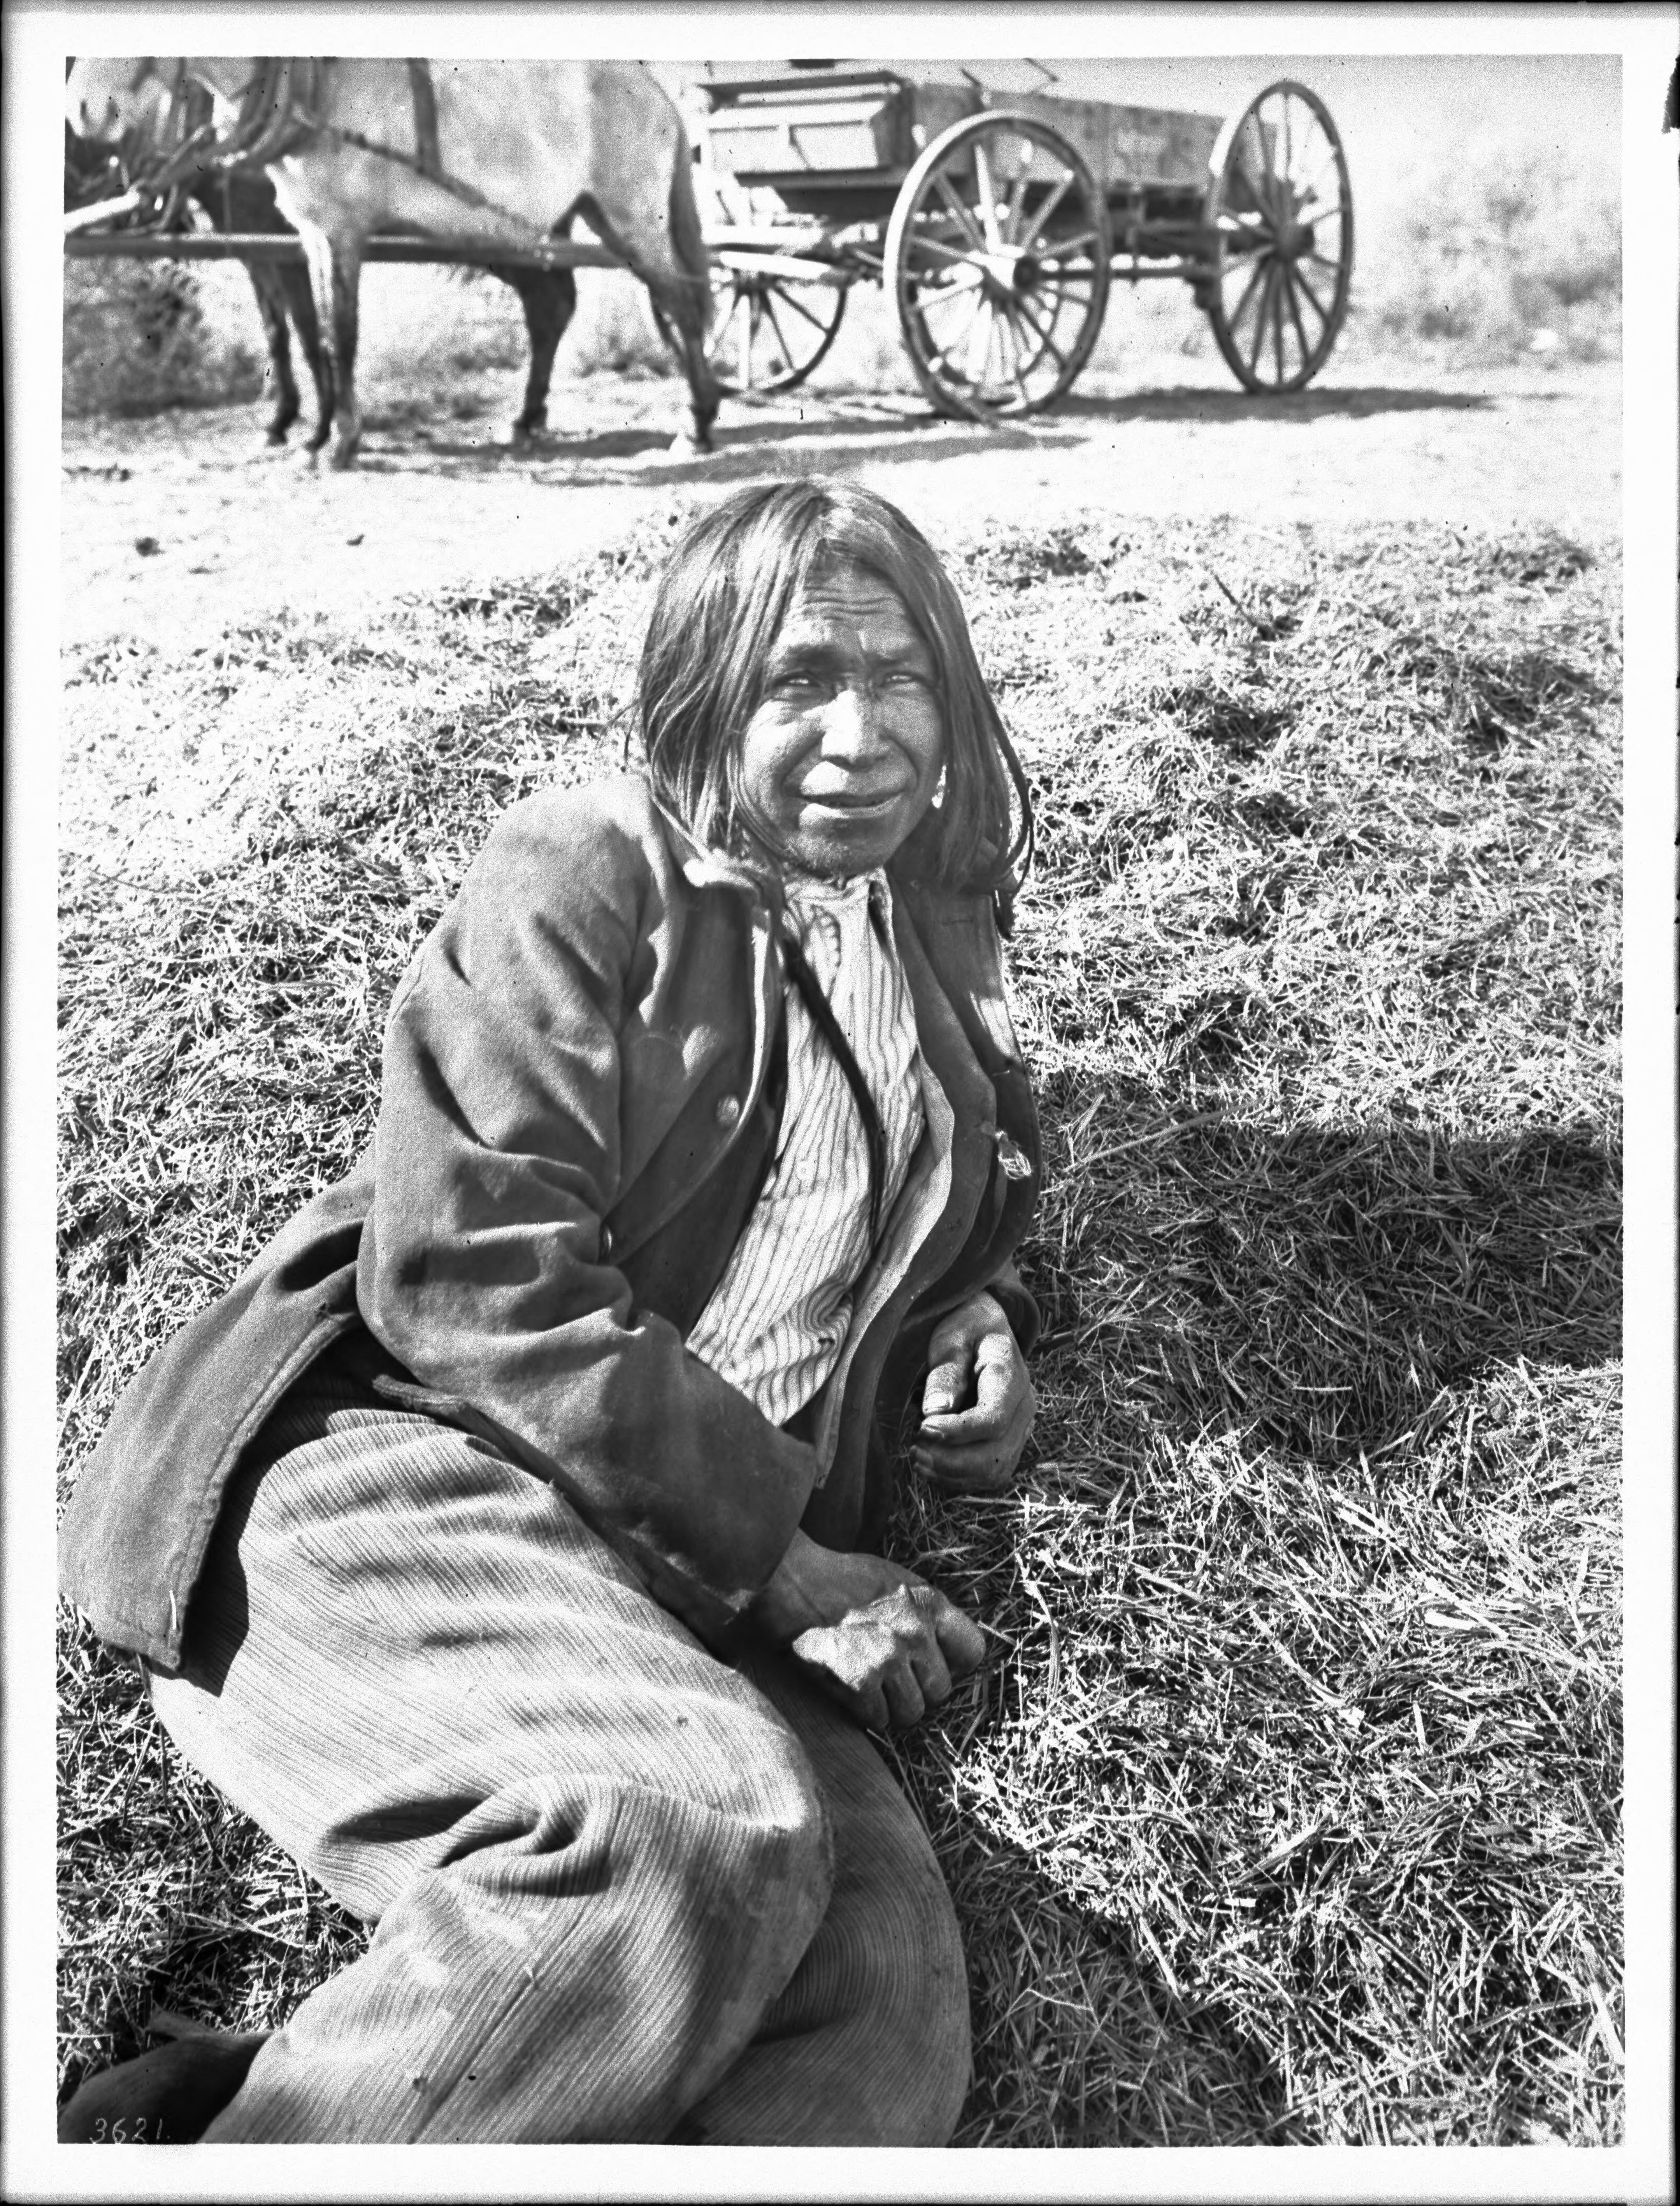 Pima Indian man, HaHitch, a farmer, Pima, Arizona